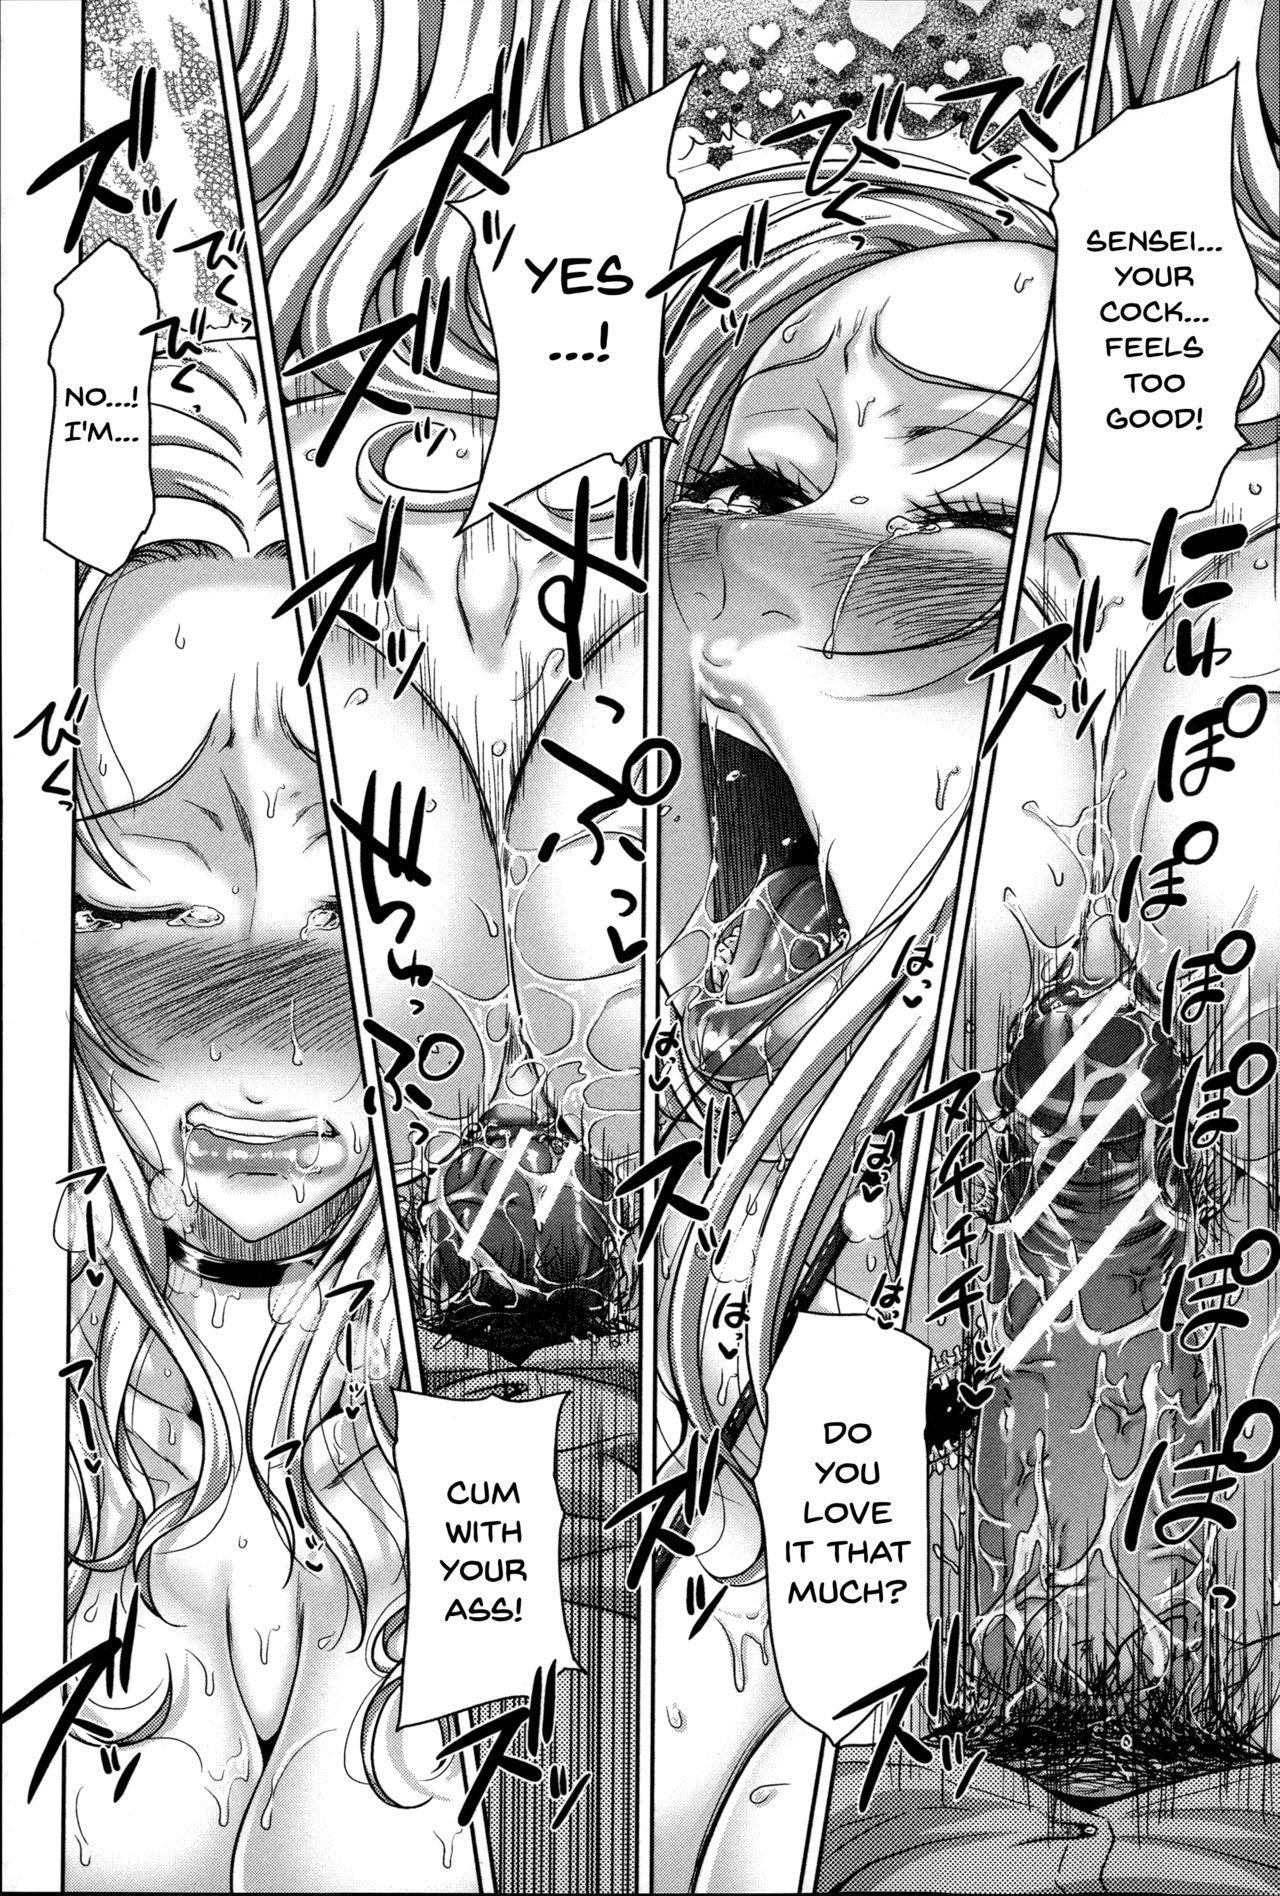 [Takuwan] Pakotate! Seikouritsu 0% no Teppeki Bishojo VS Seikouritsu 100% no Hentai Katei Kyoushi   Pakotate! Sex Rate 0% Iron-Willed Beautiful Virgins VS Sex Rate 100% Perverted Coach Ch.1-5 [English] {Doujins.com} 33